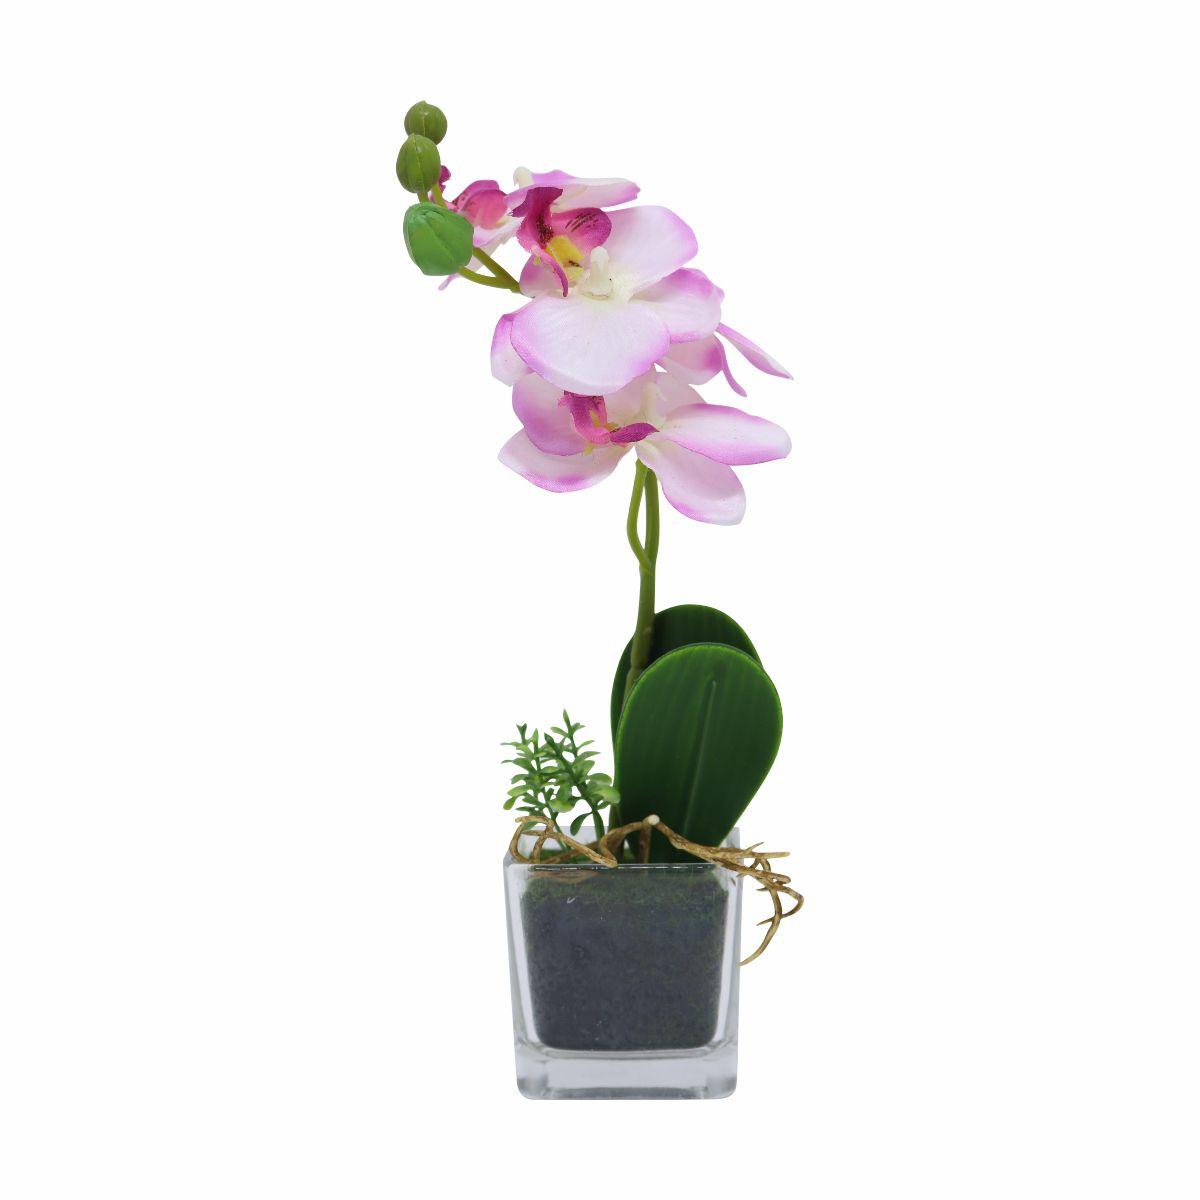 Orquídea Phalaenopsis artificial Rosa com Vaso de Vidro X5 21cm - 36686001R